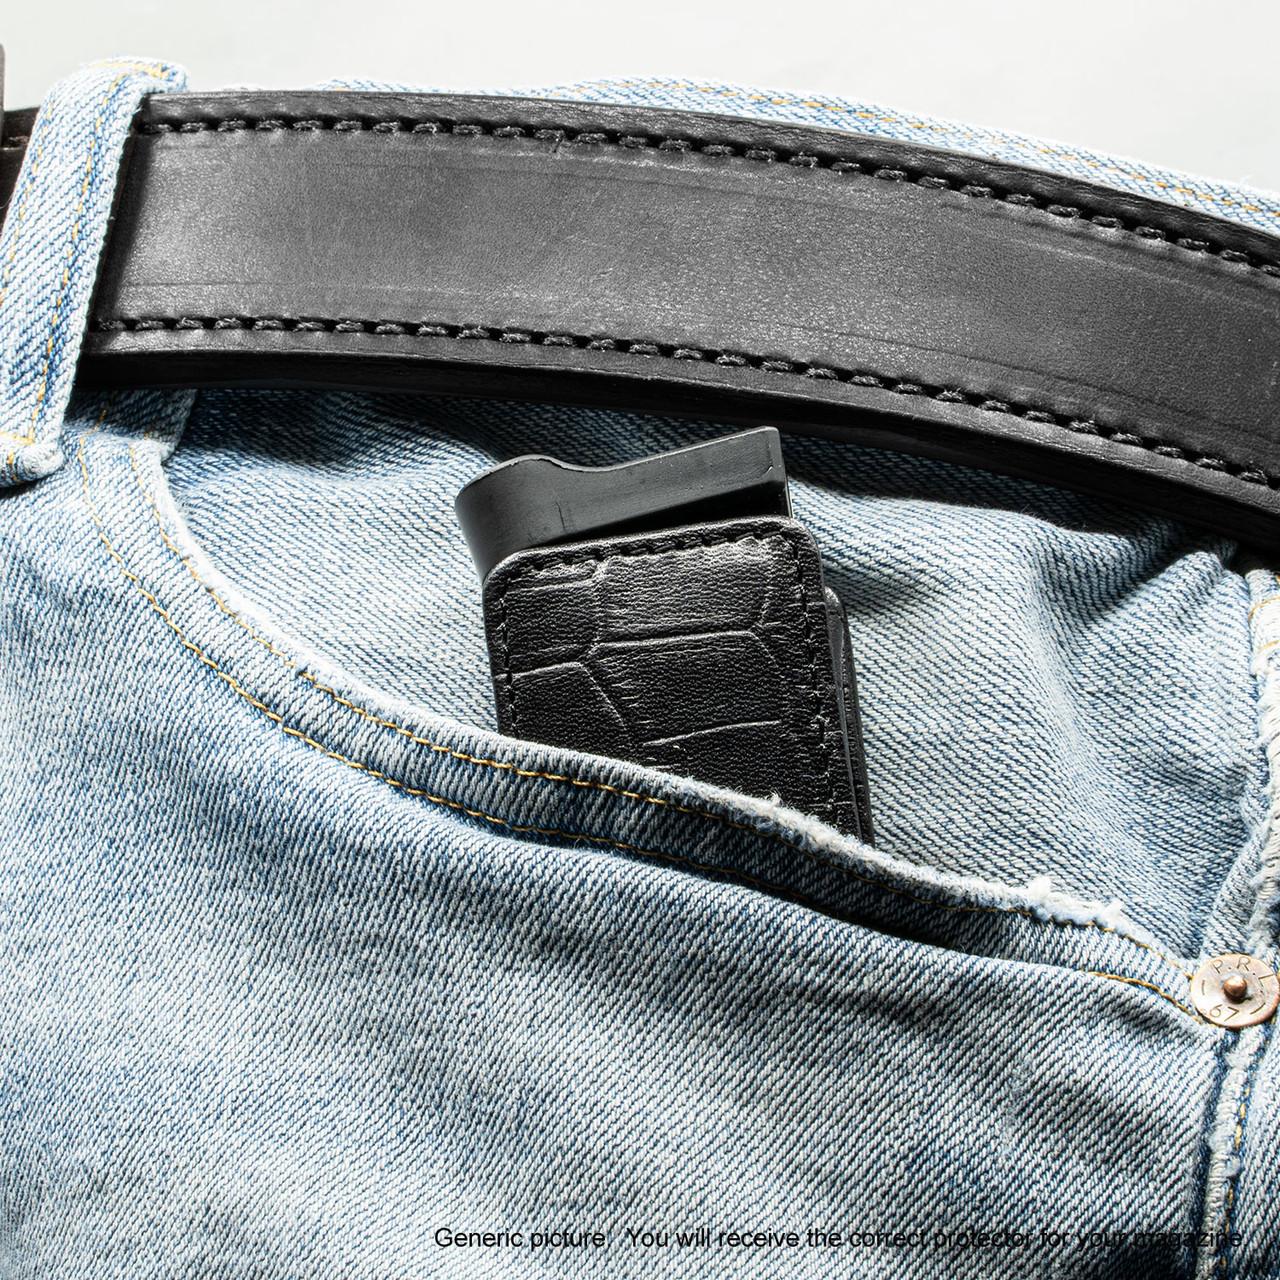 Kahr MK9 Black Alligator Magazine Pocket Protector